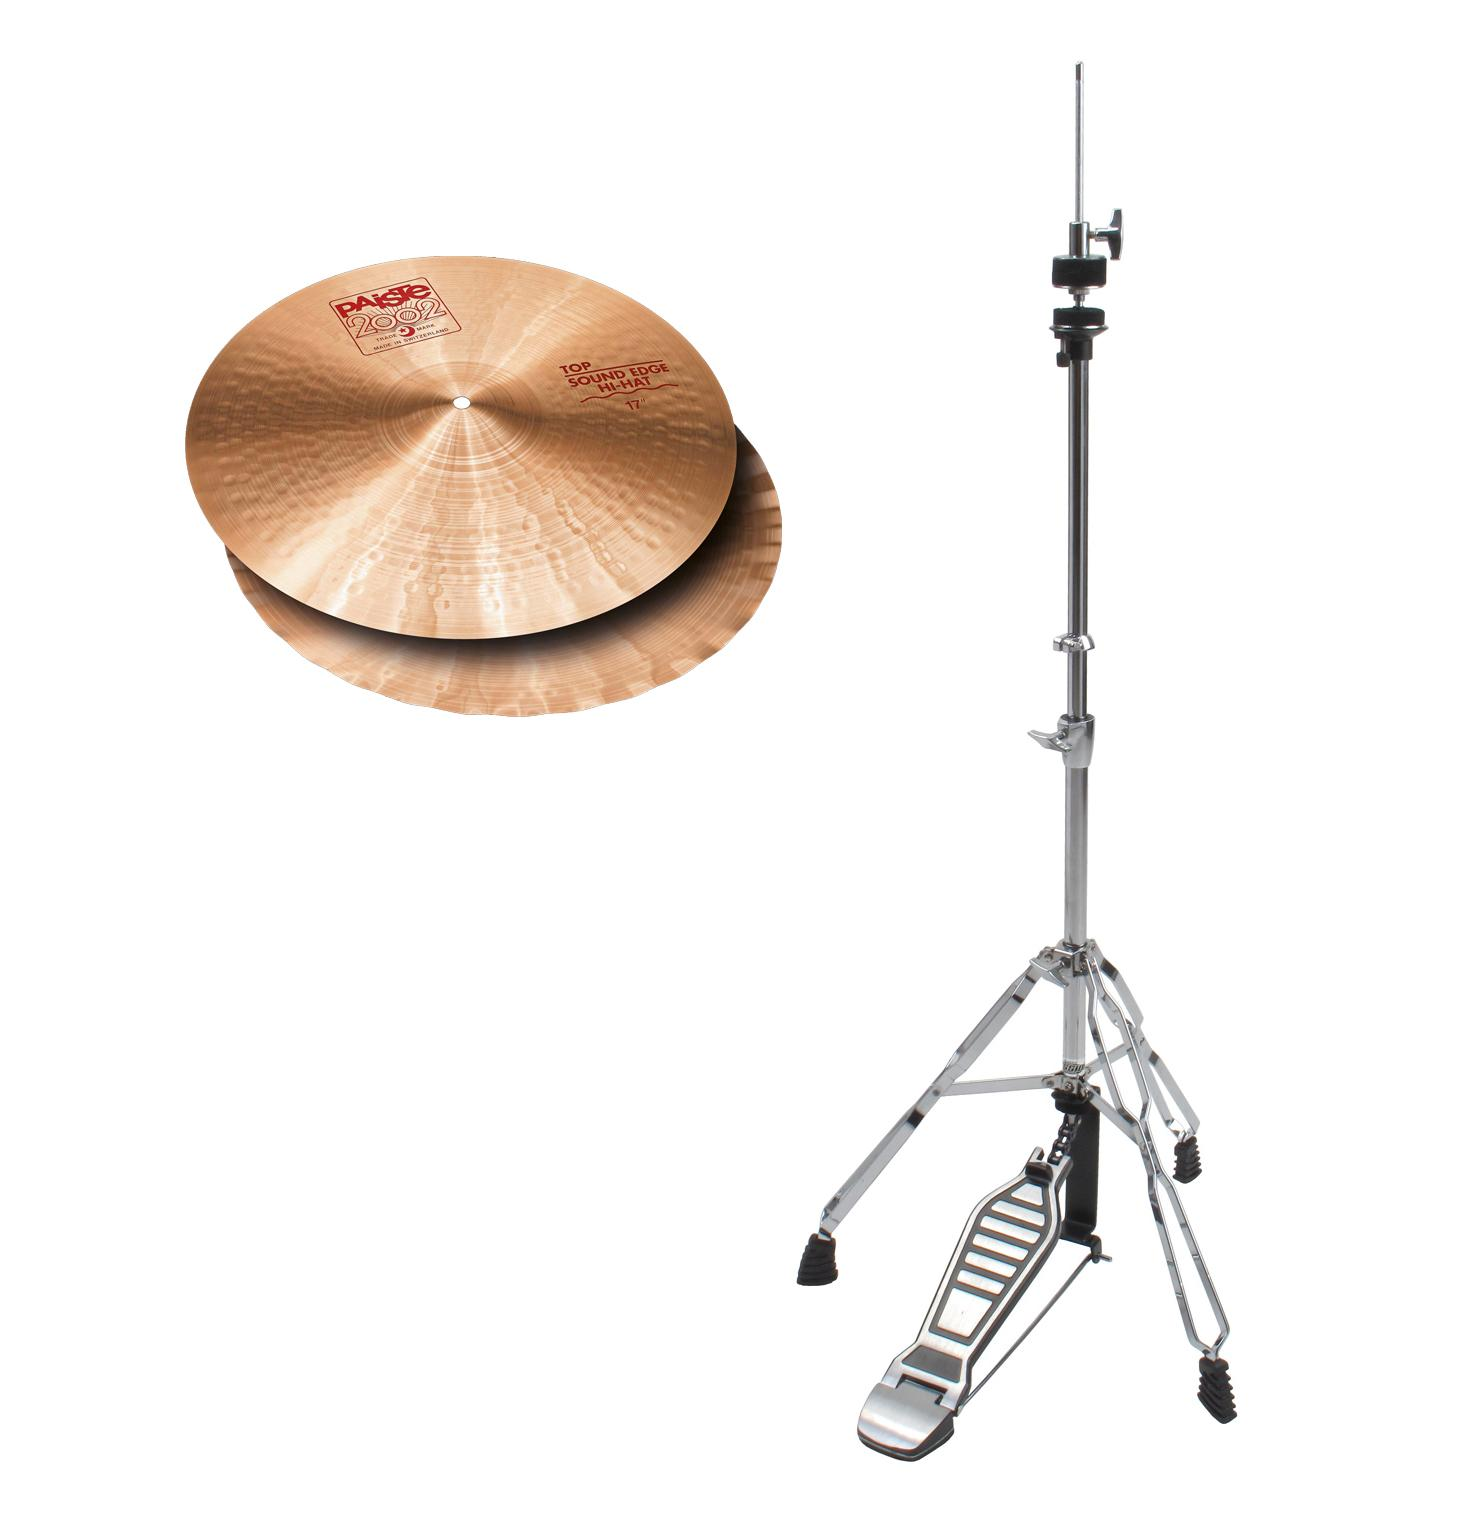 Paiste 2002 14' Sound Edge Hi Hat HiHat Maschine SET